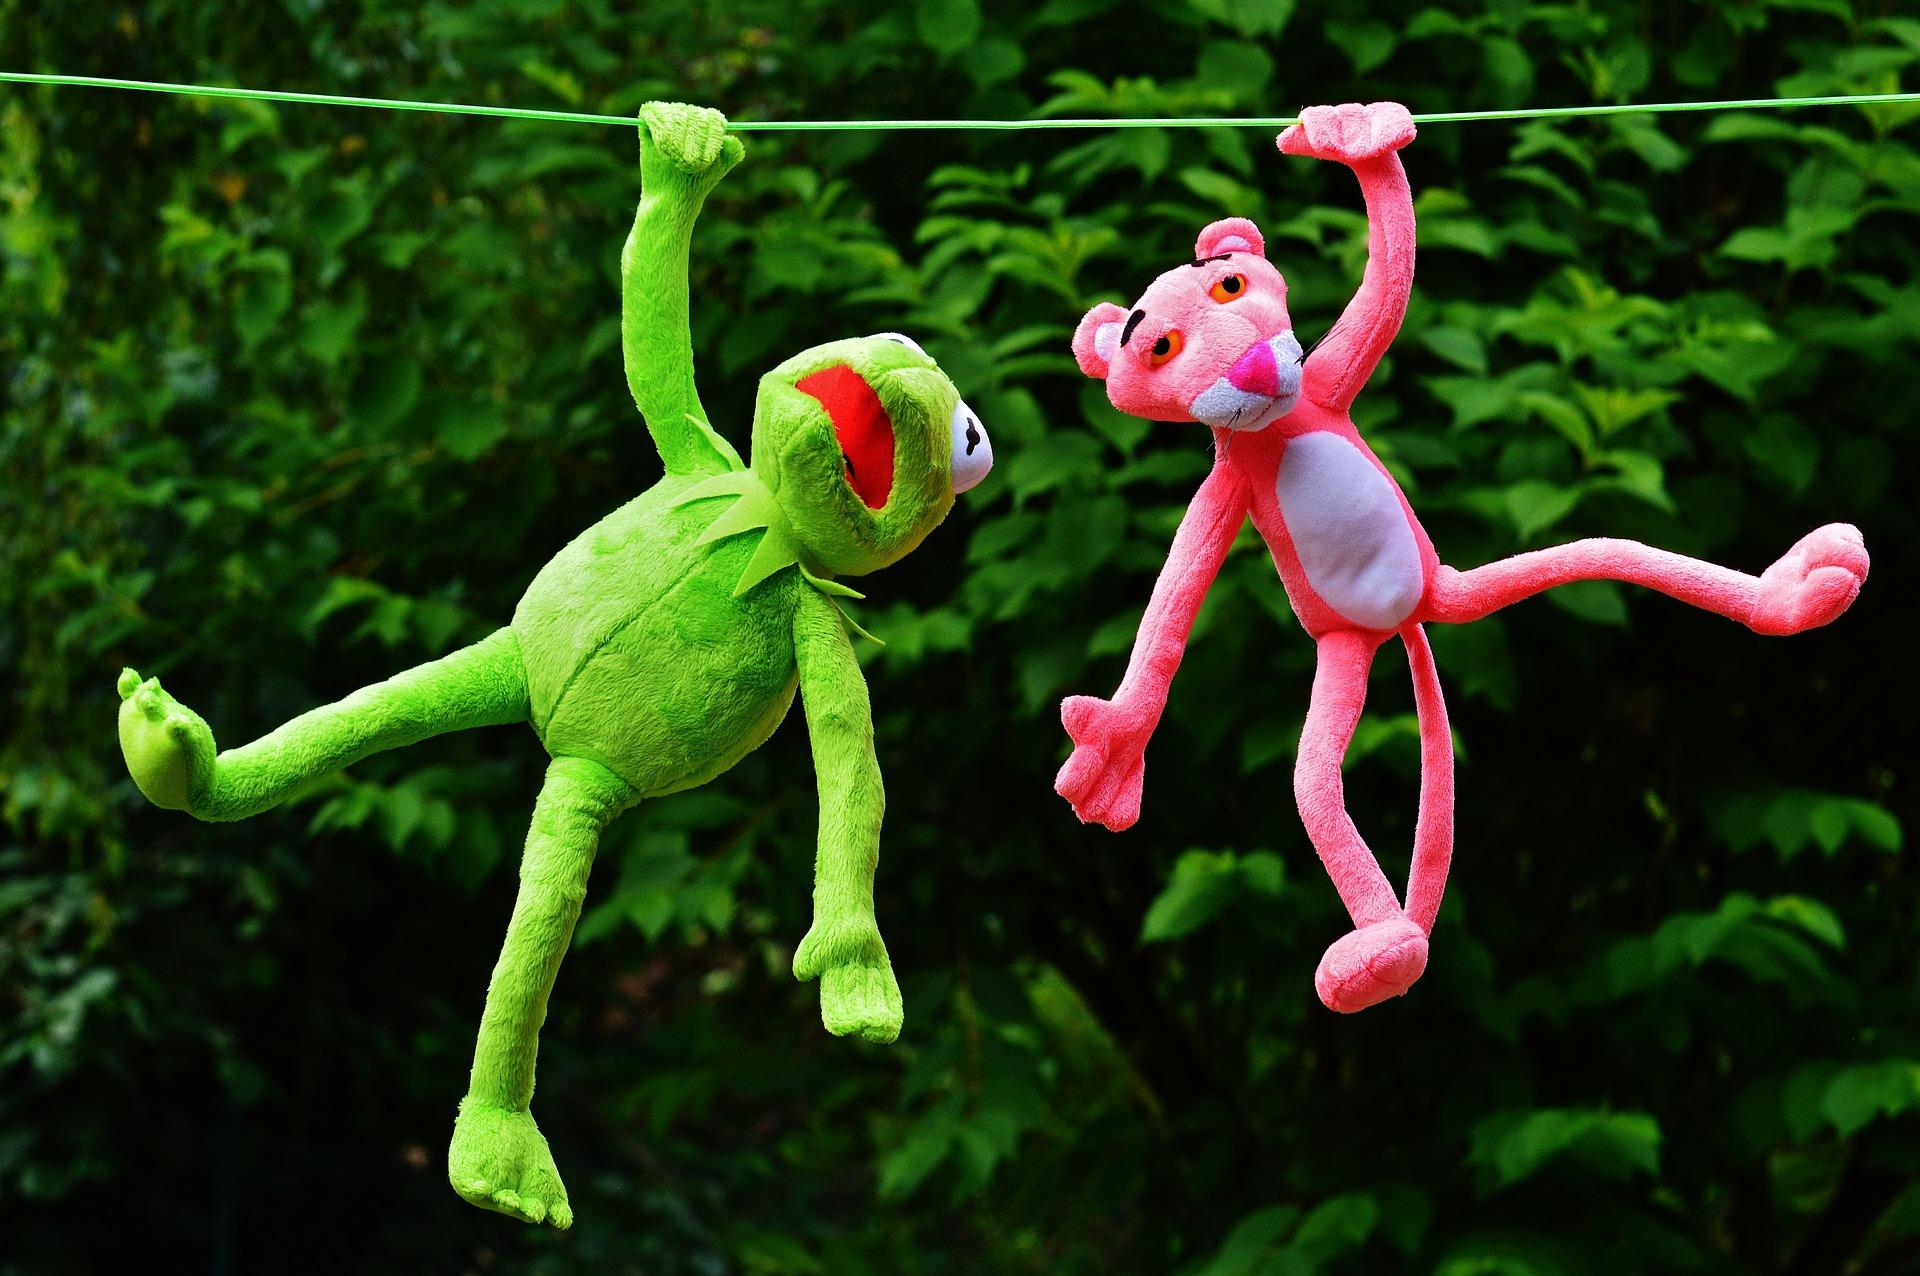 jouets, jouets en peluche, Gustavo, Panthère rose, Kermit, Accroché - Fonds d'écran HD - Professor-falken.com